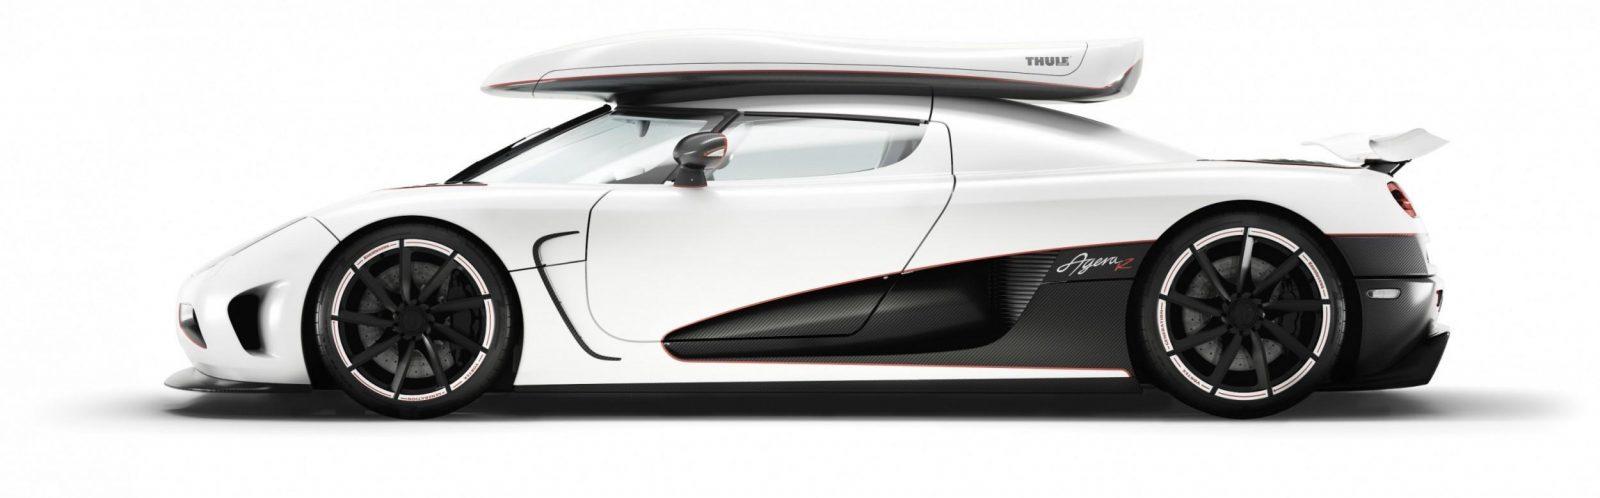 Koenigsegg Agera R Adds 240HP for Potential 280MPH Vmax of Generva-bound One1 Edition24